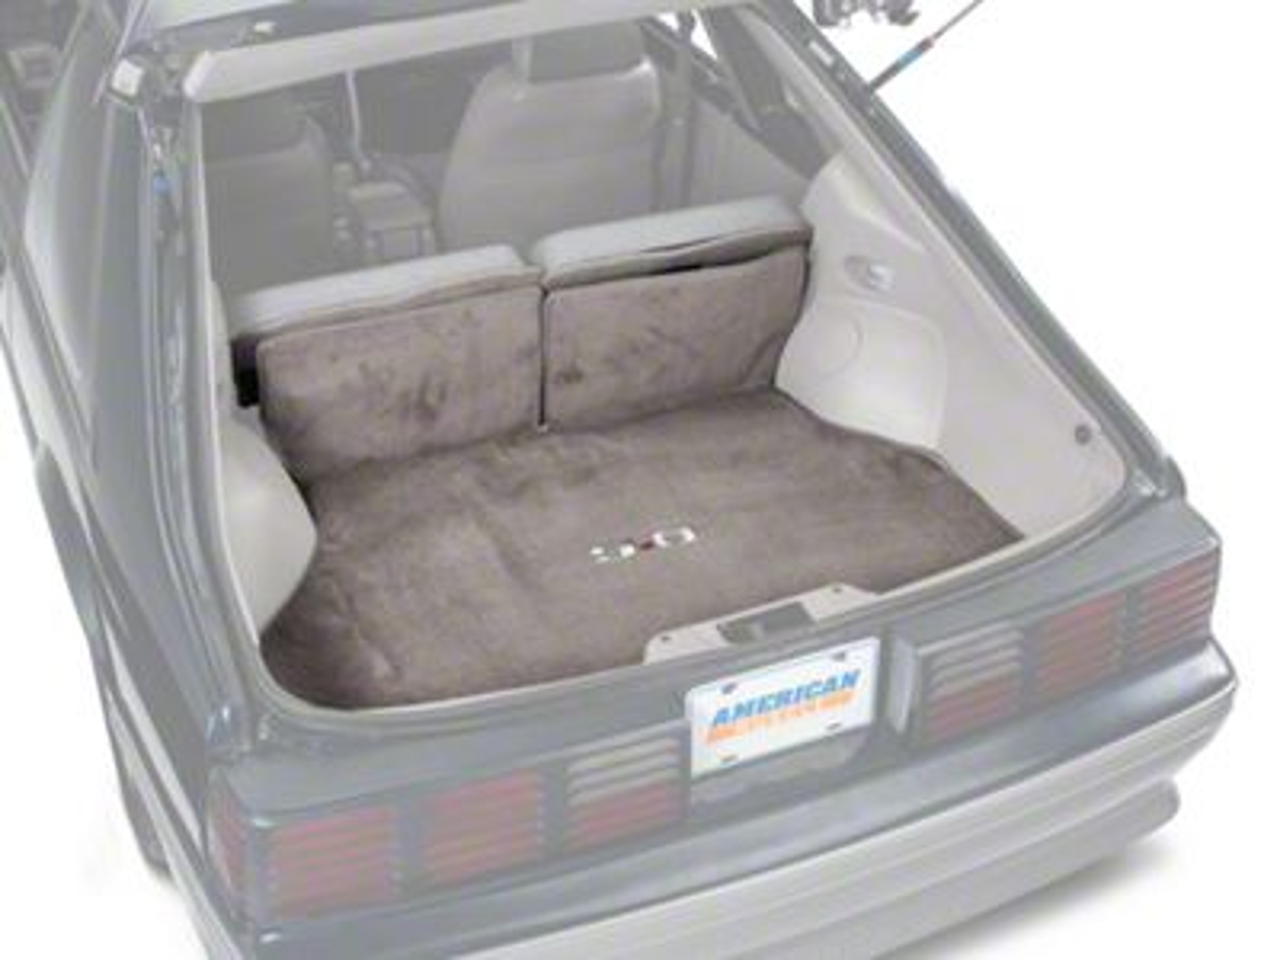 OPR Replacement Hatch Carpet w/ 5.0 Logo - Smoke Gray (87-89 Hatchback)